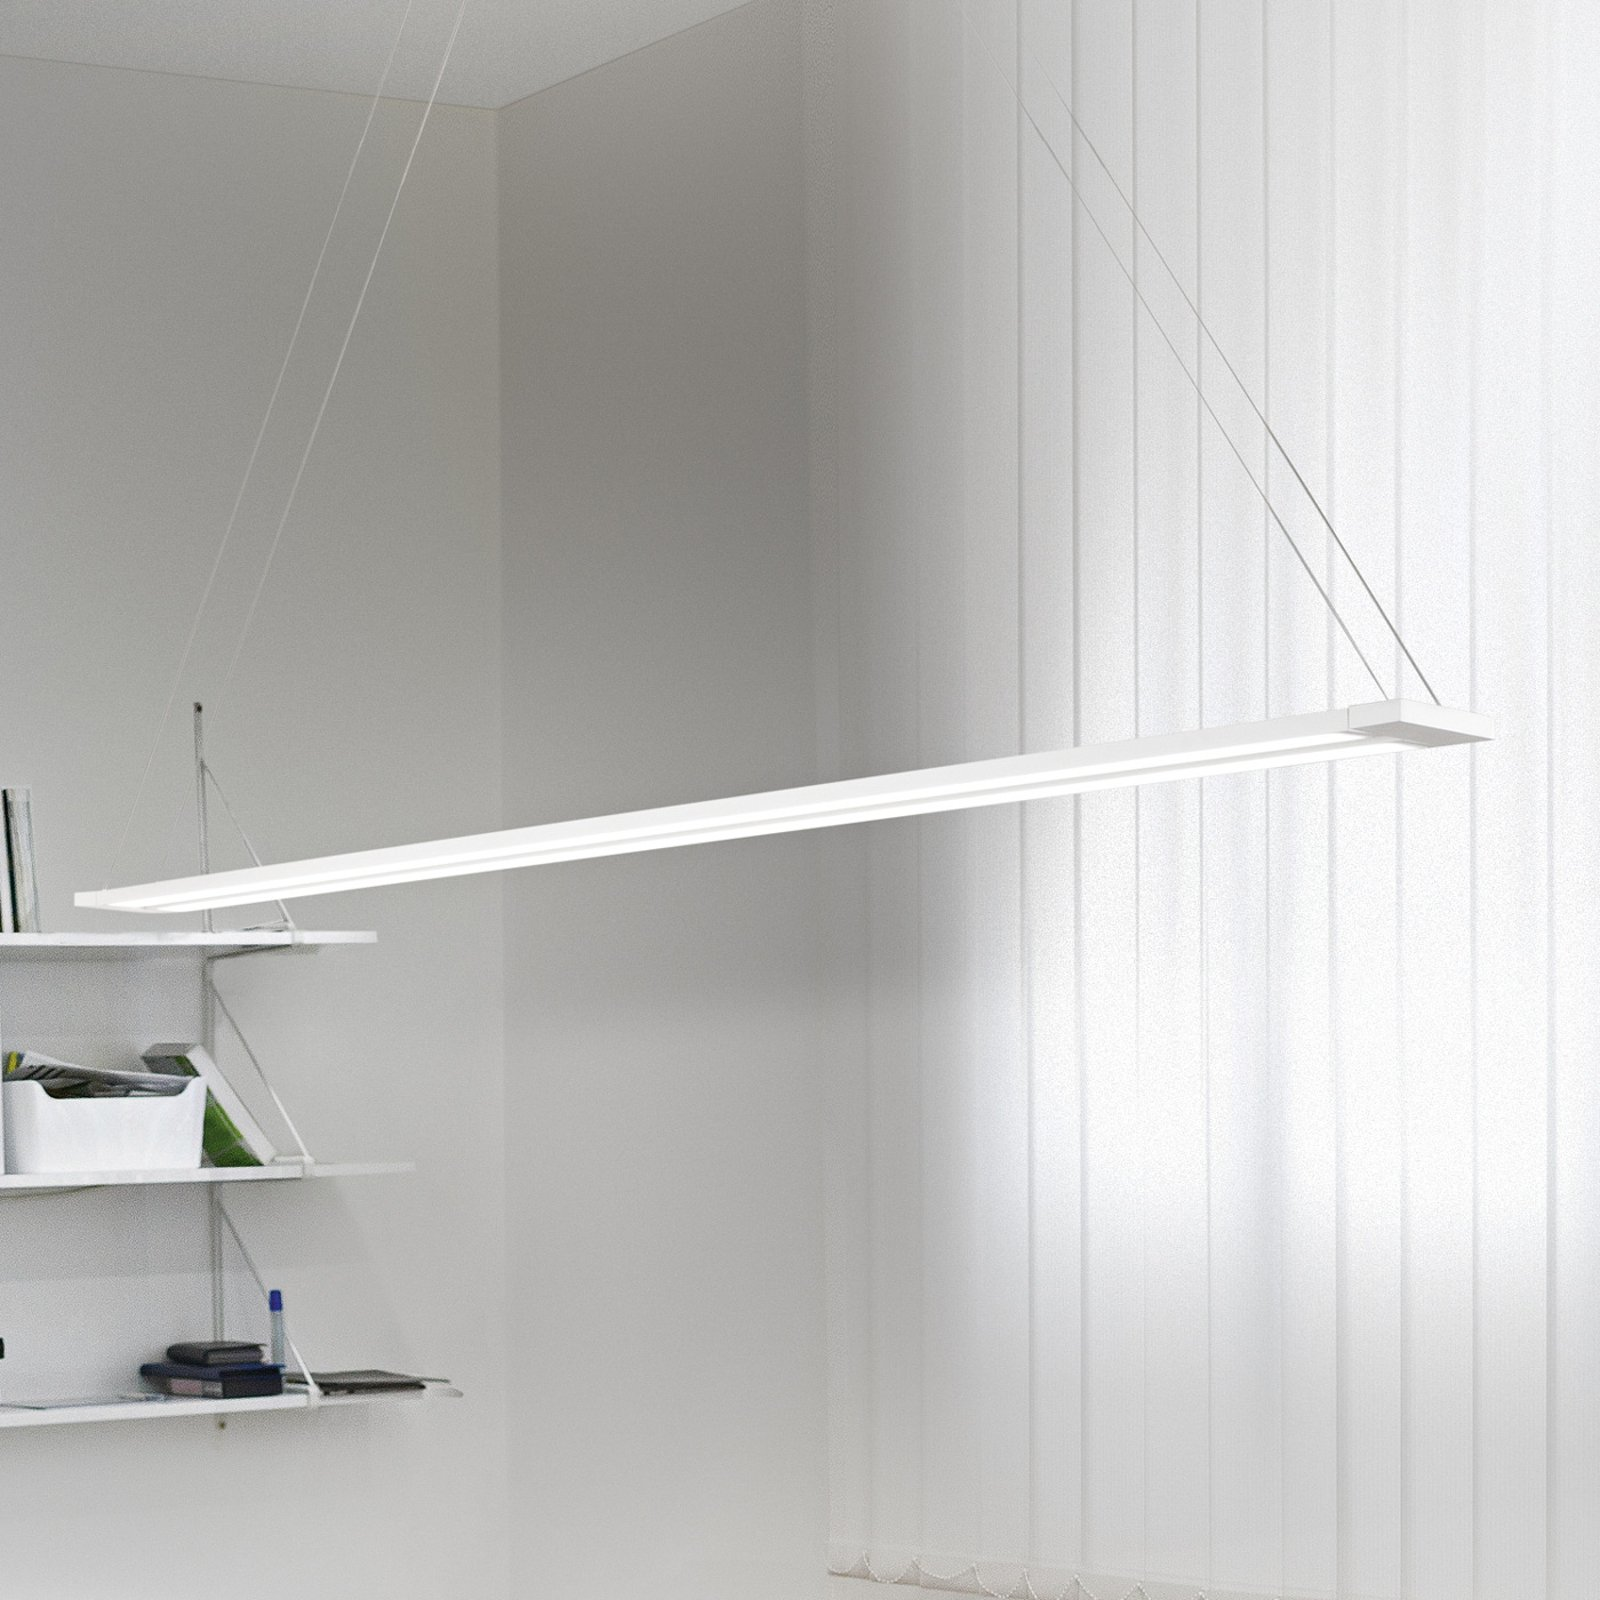 LED-vegglampe Sway, dreibart lyselement